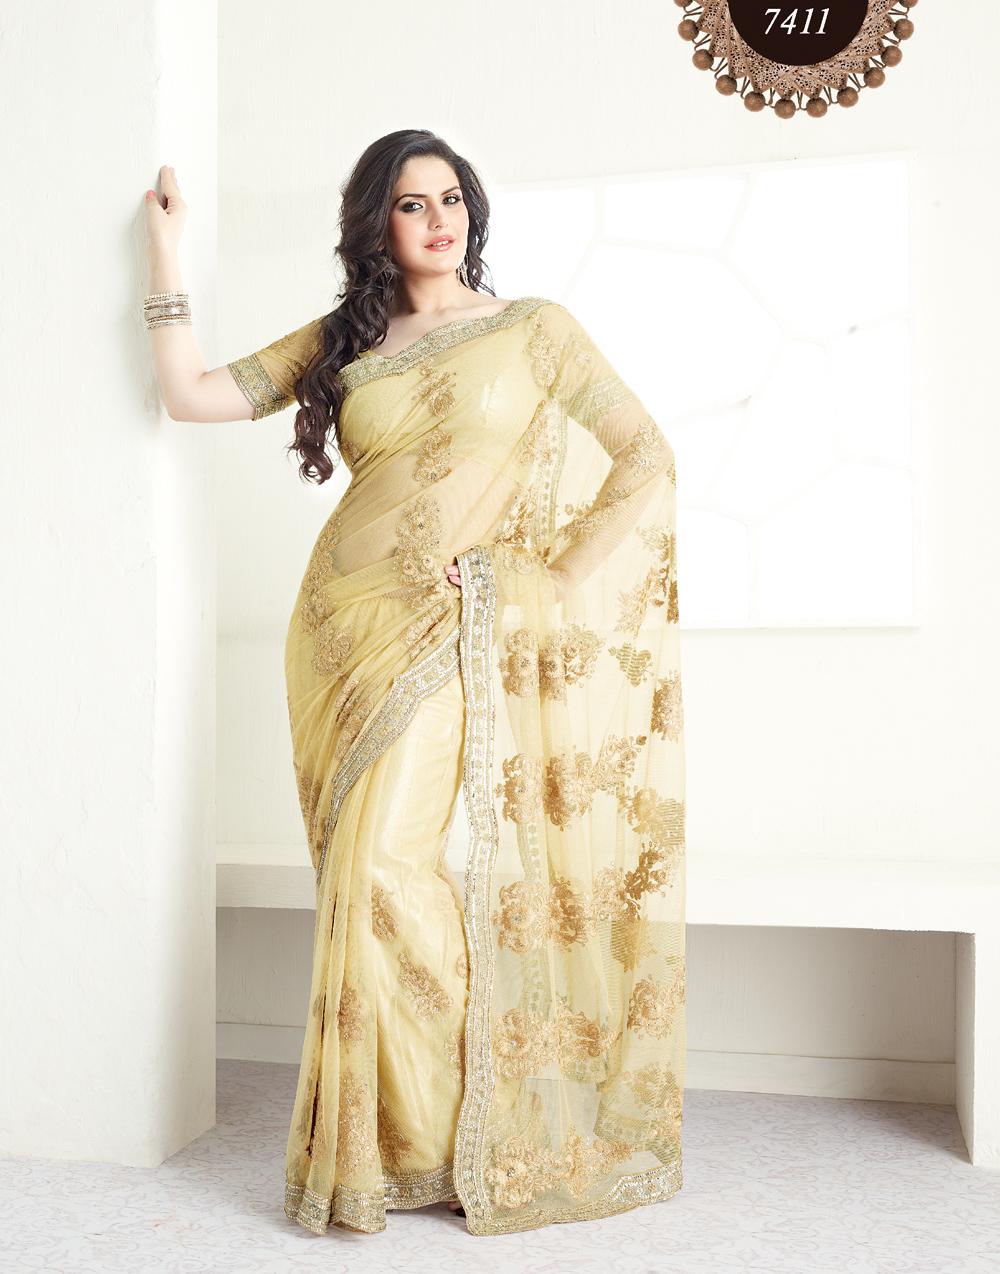 zarin khan in designers saree   missy lovesx3